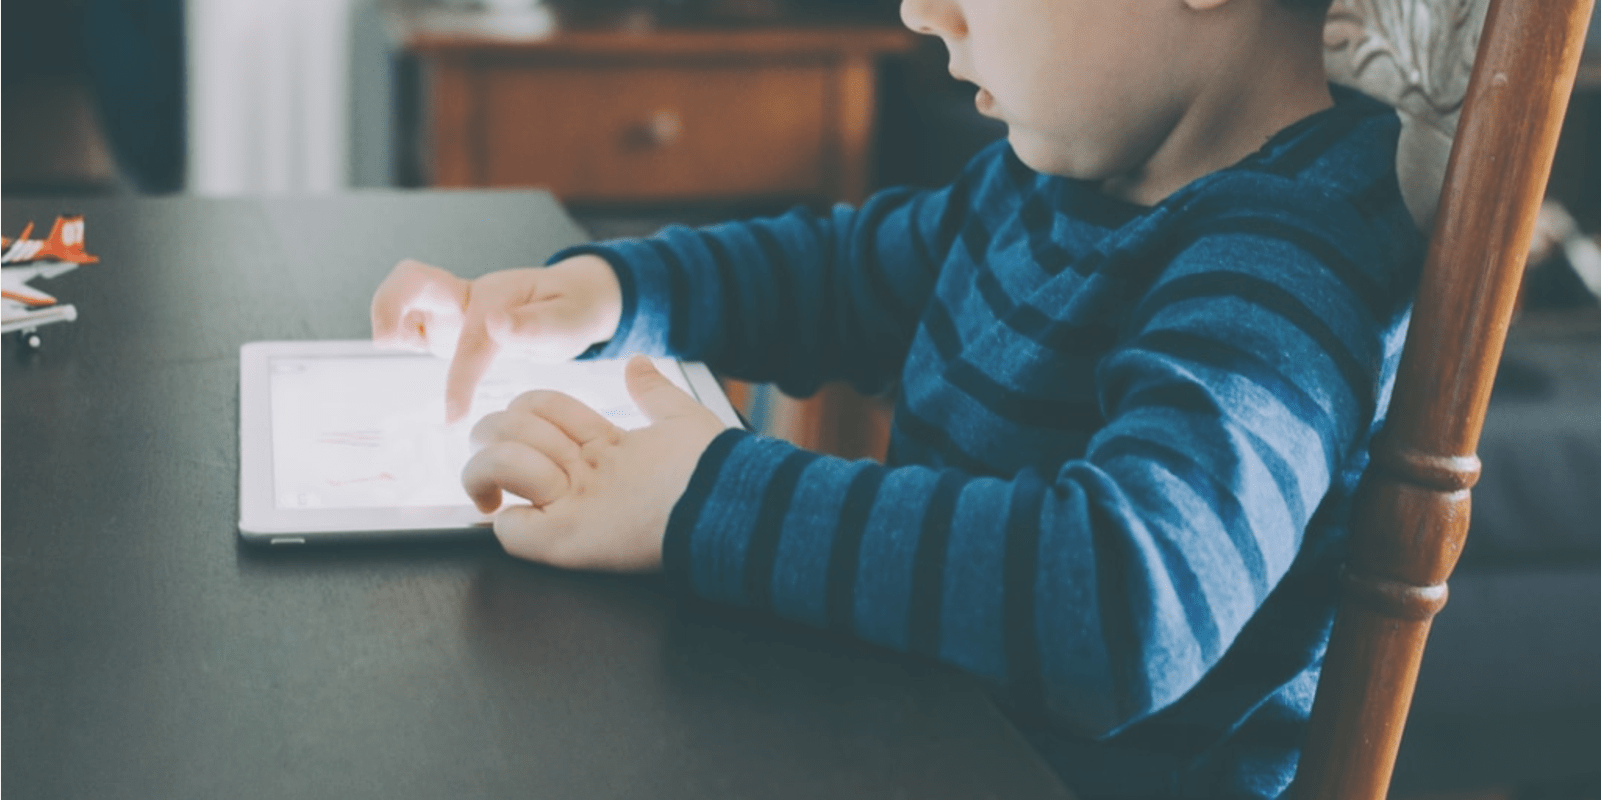 Educational Technology 2030